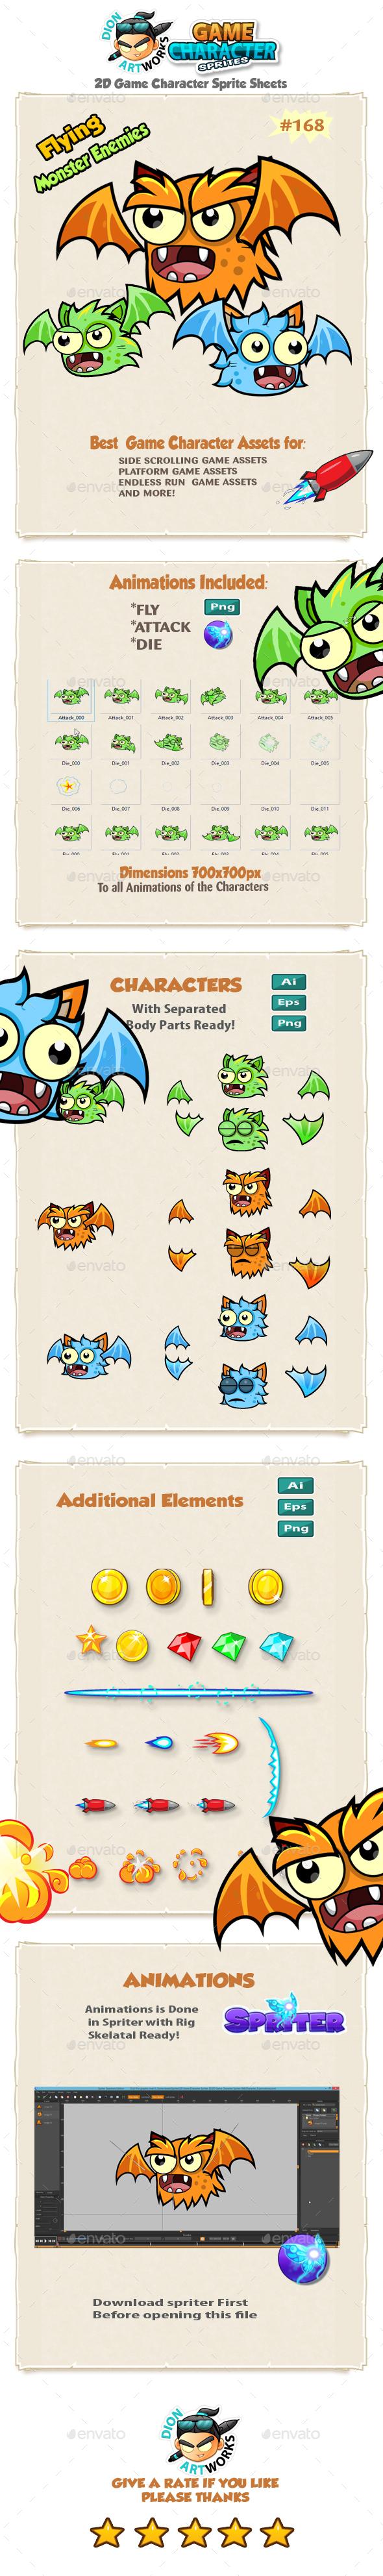 Flying Monster Enemies Game Character Sprites 168 - Sprites Game Assets